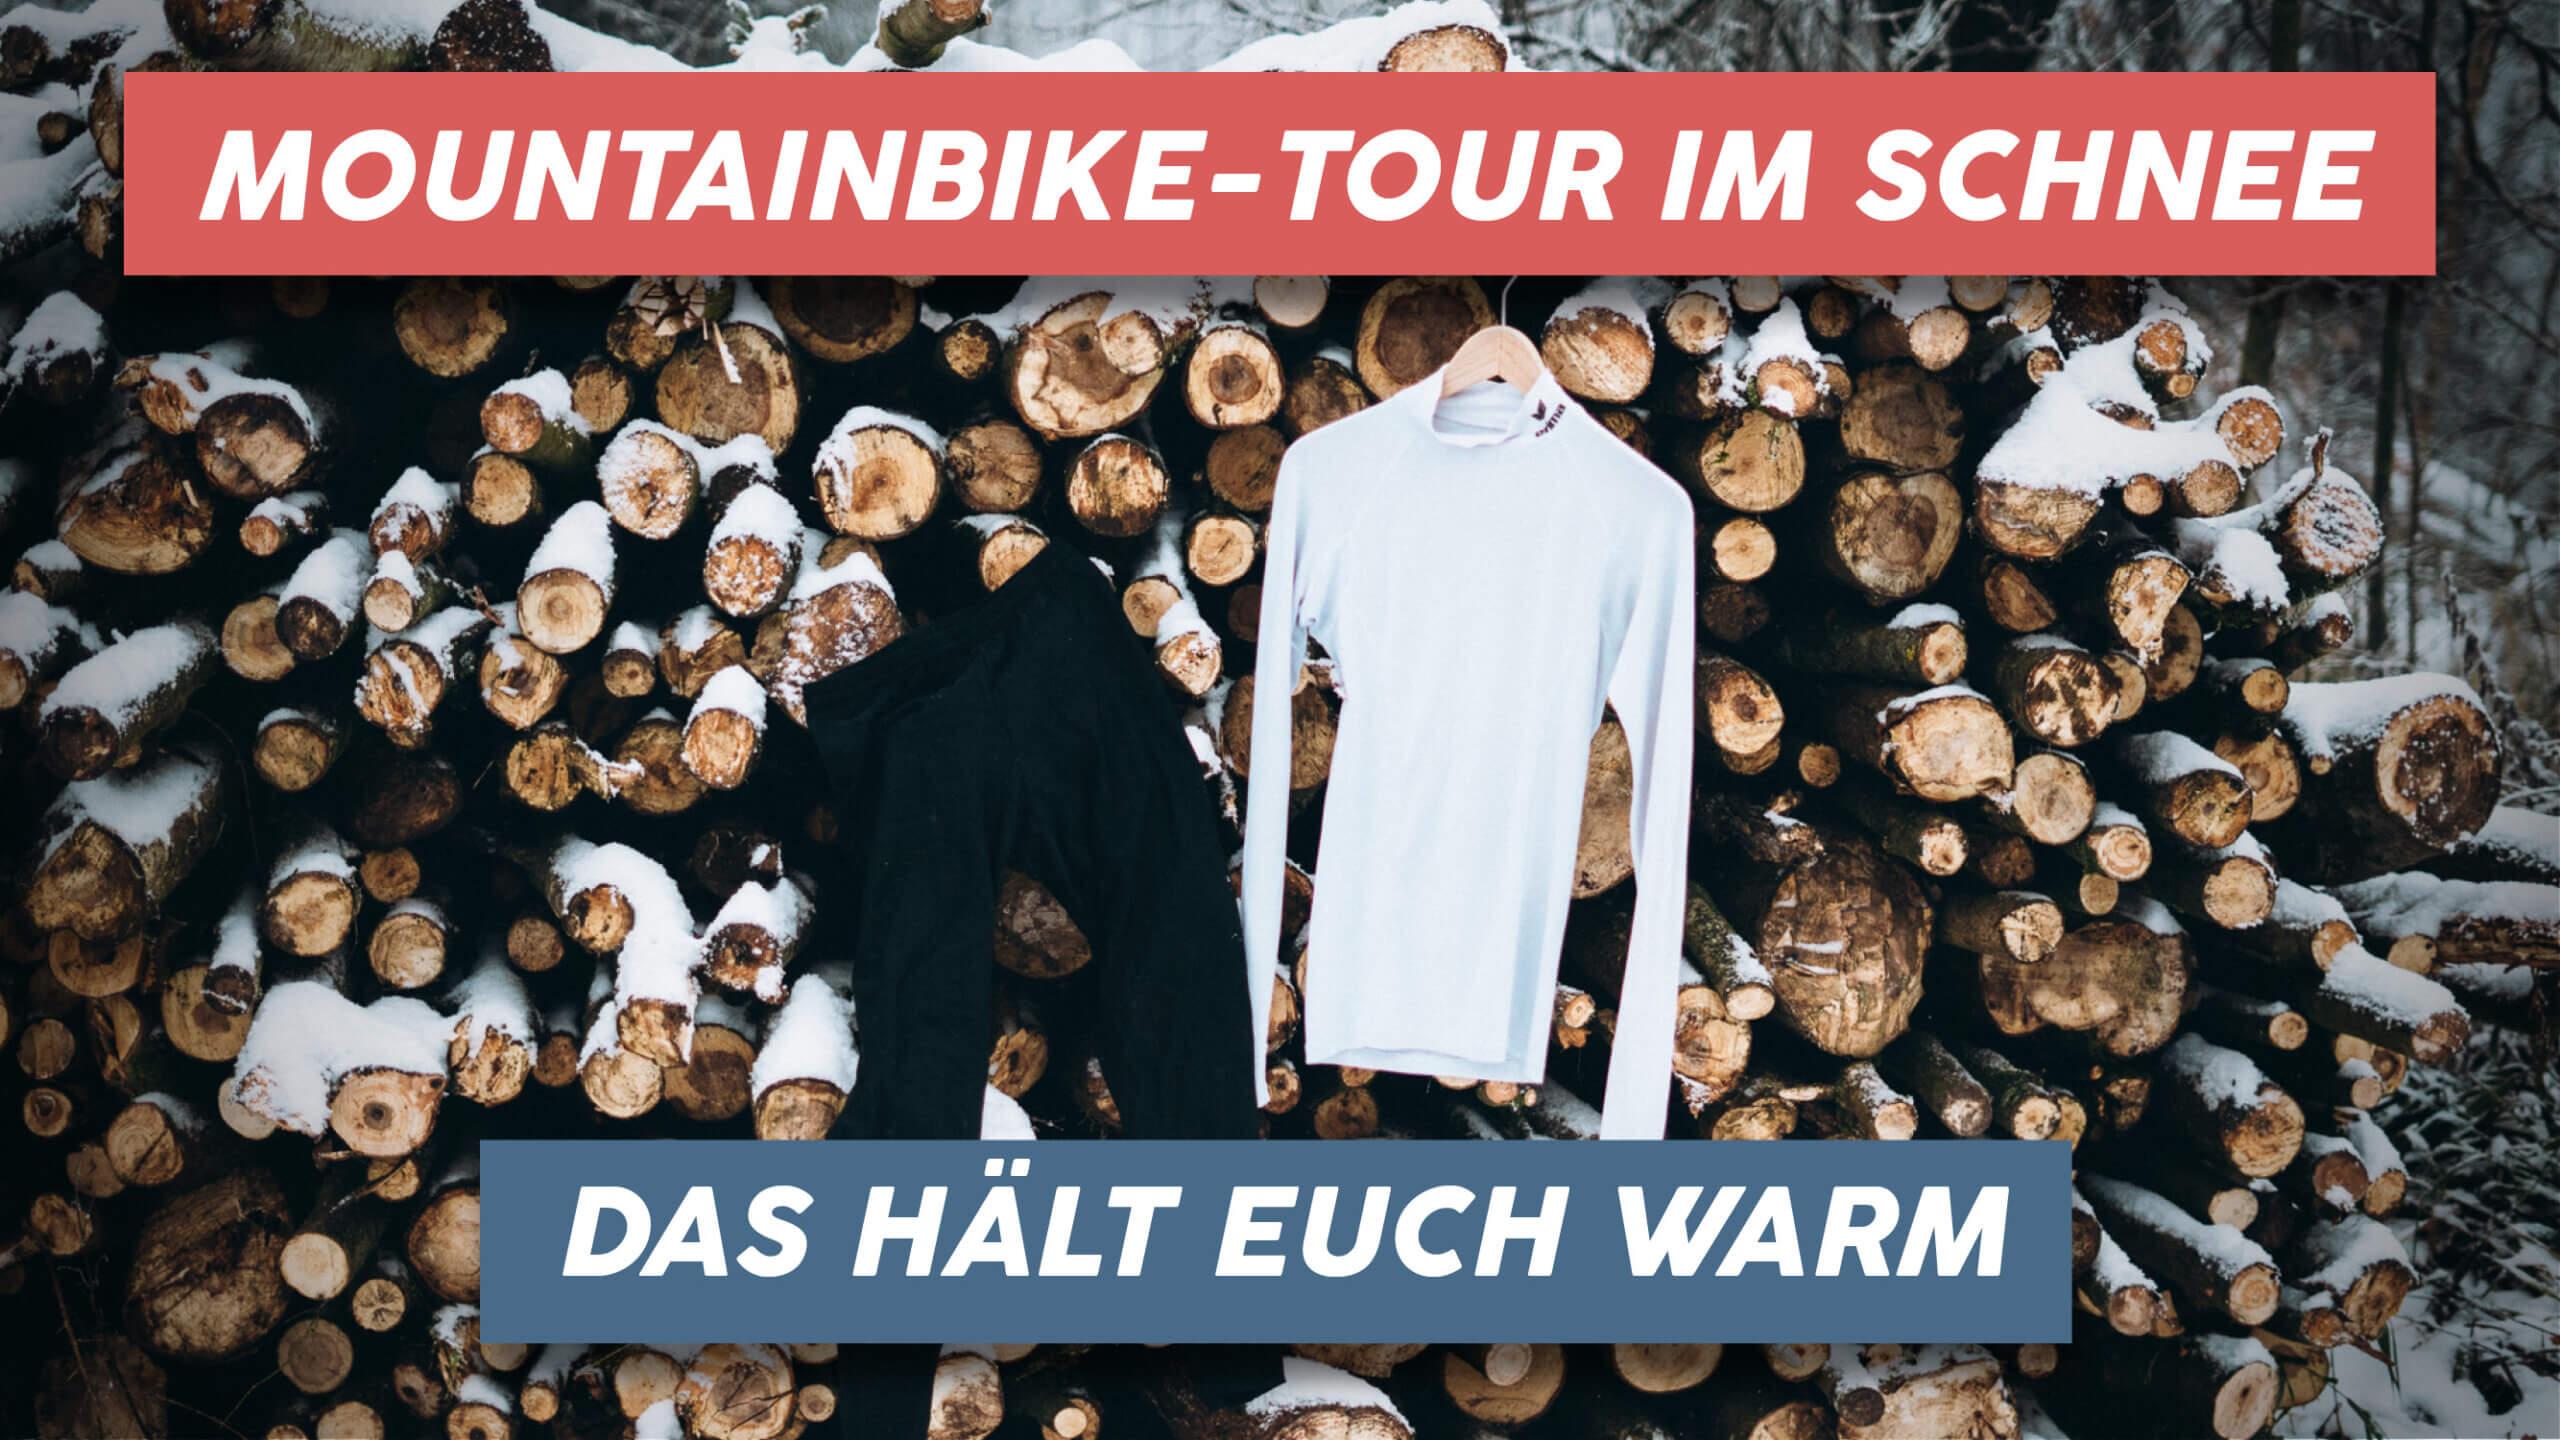 Mountainbike Tour im Schnee